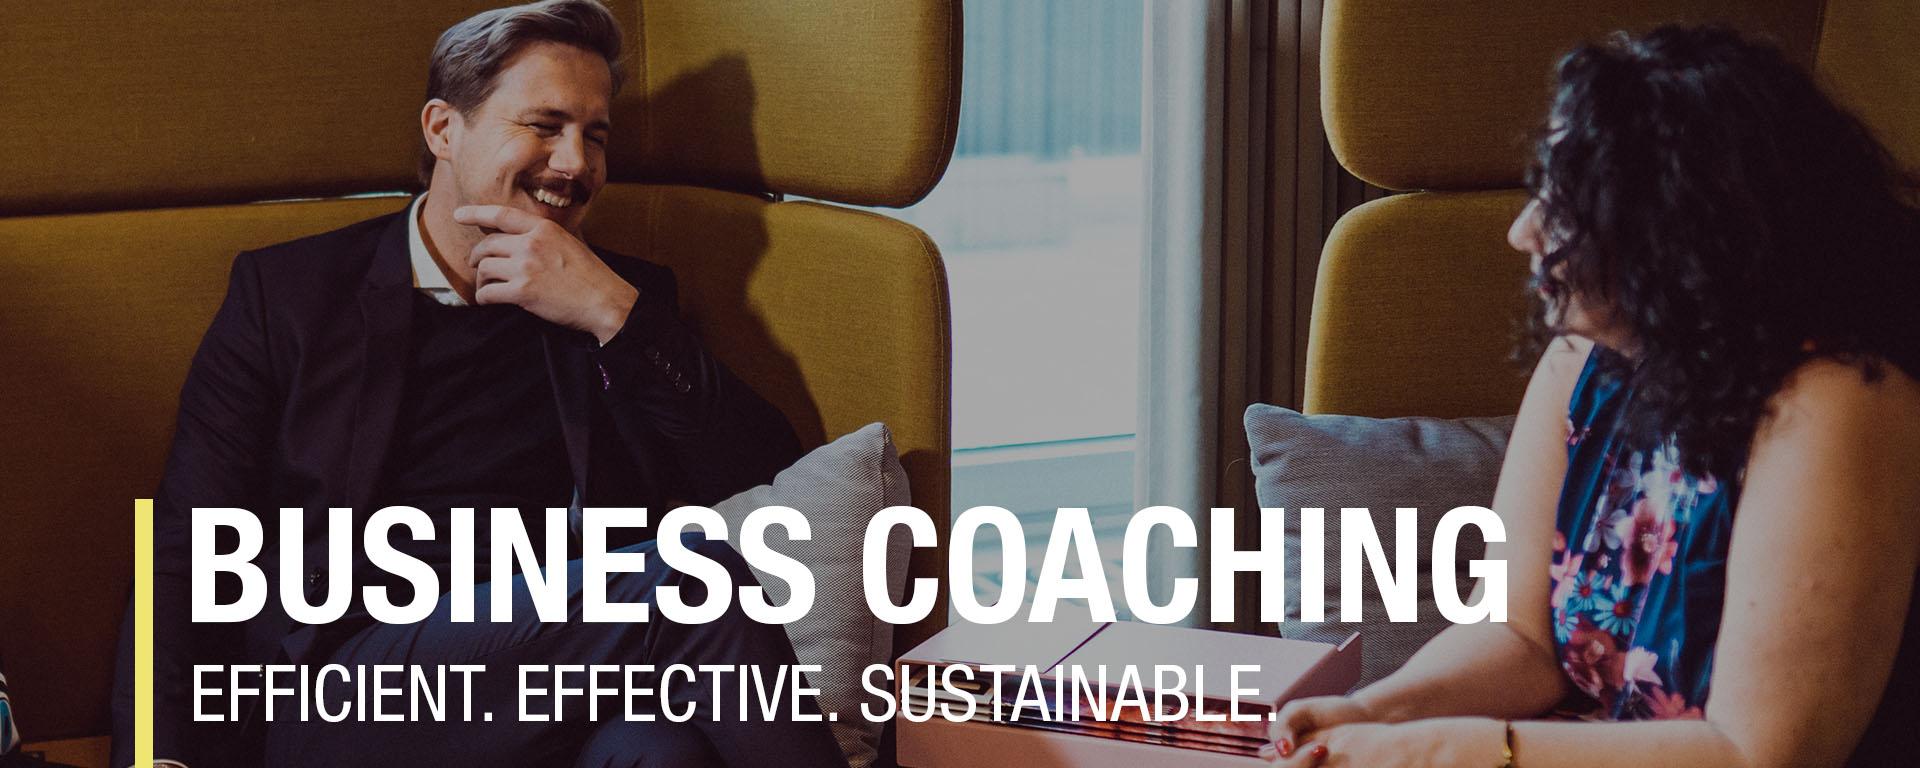 Online Coaching, Business Coaching, Leadership, Leadership Training